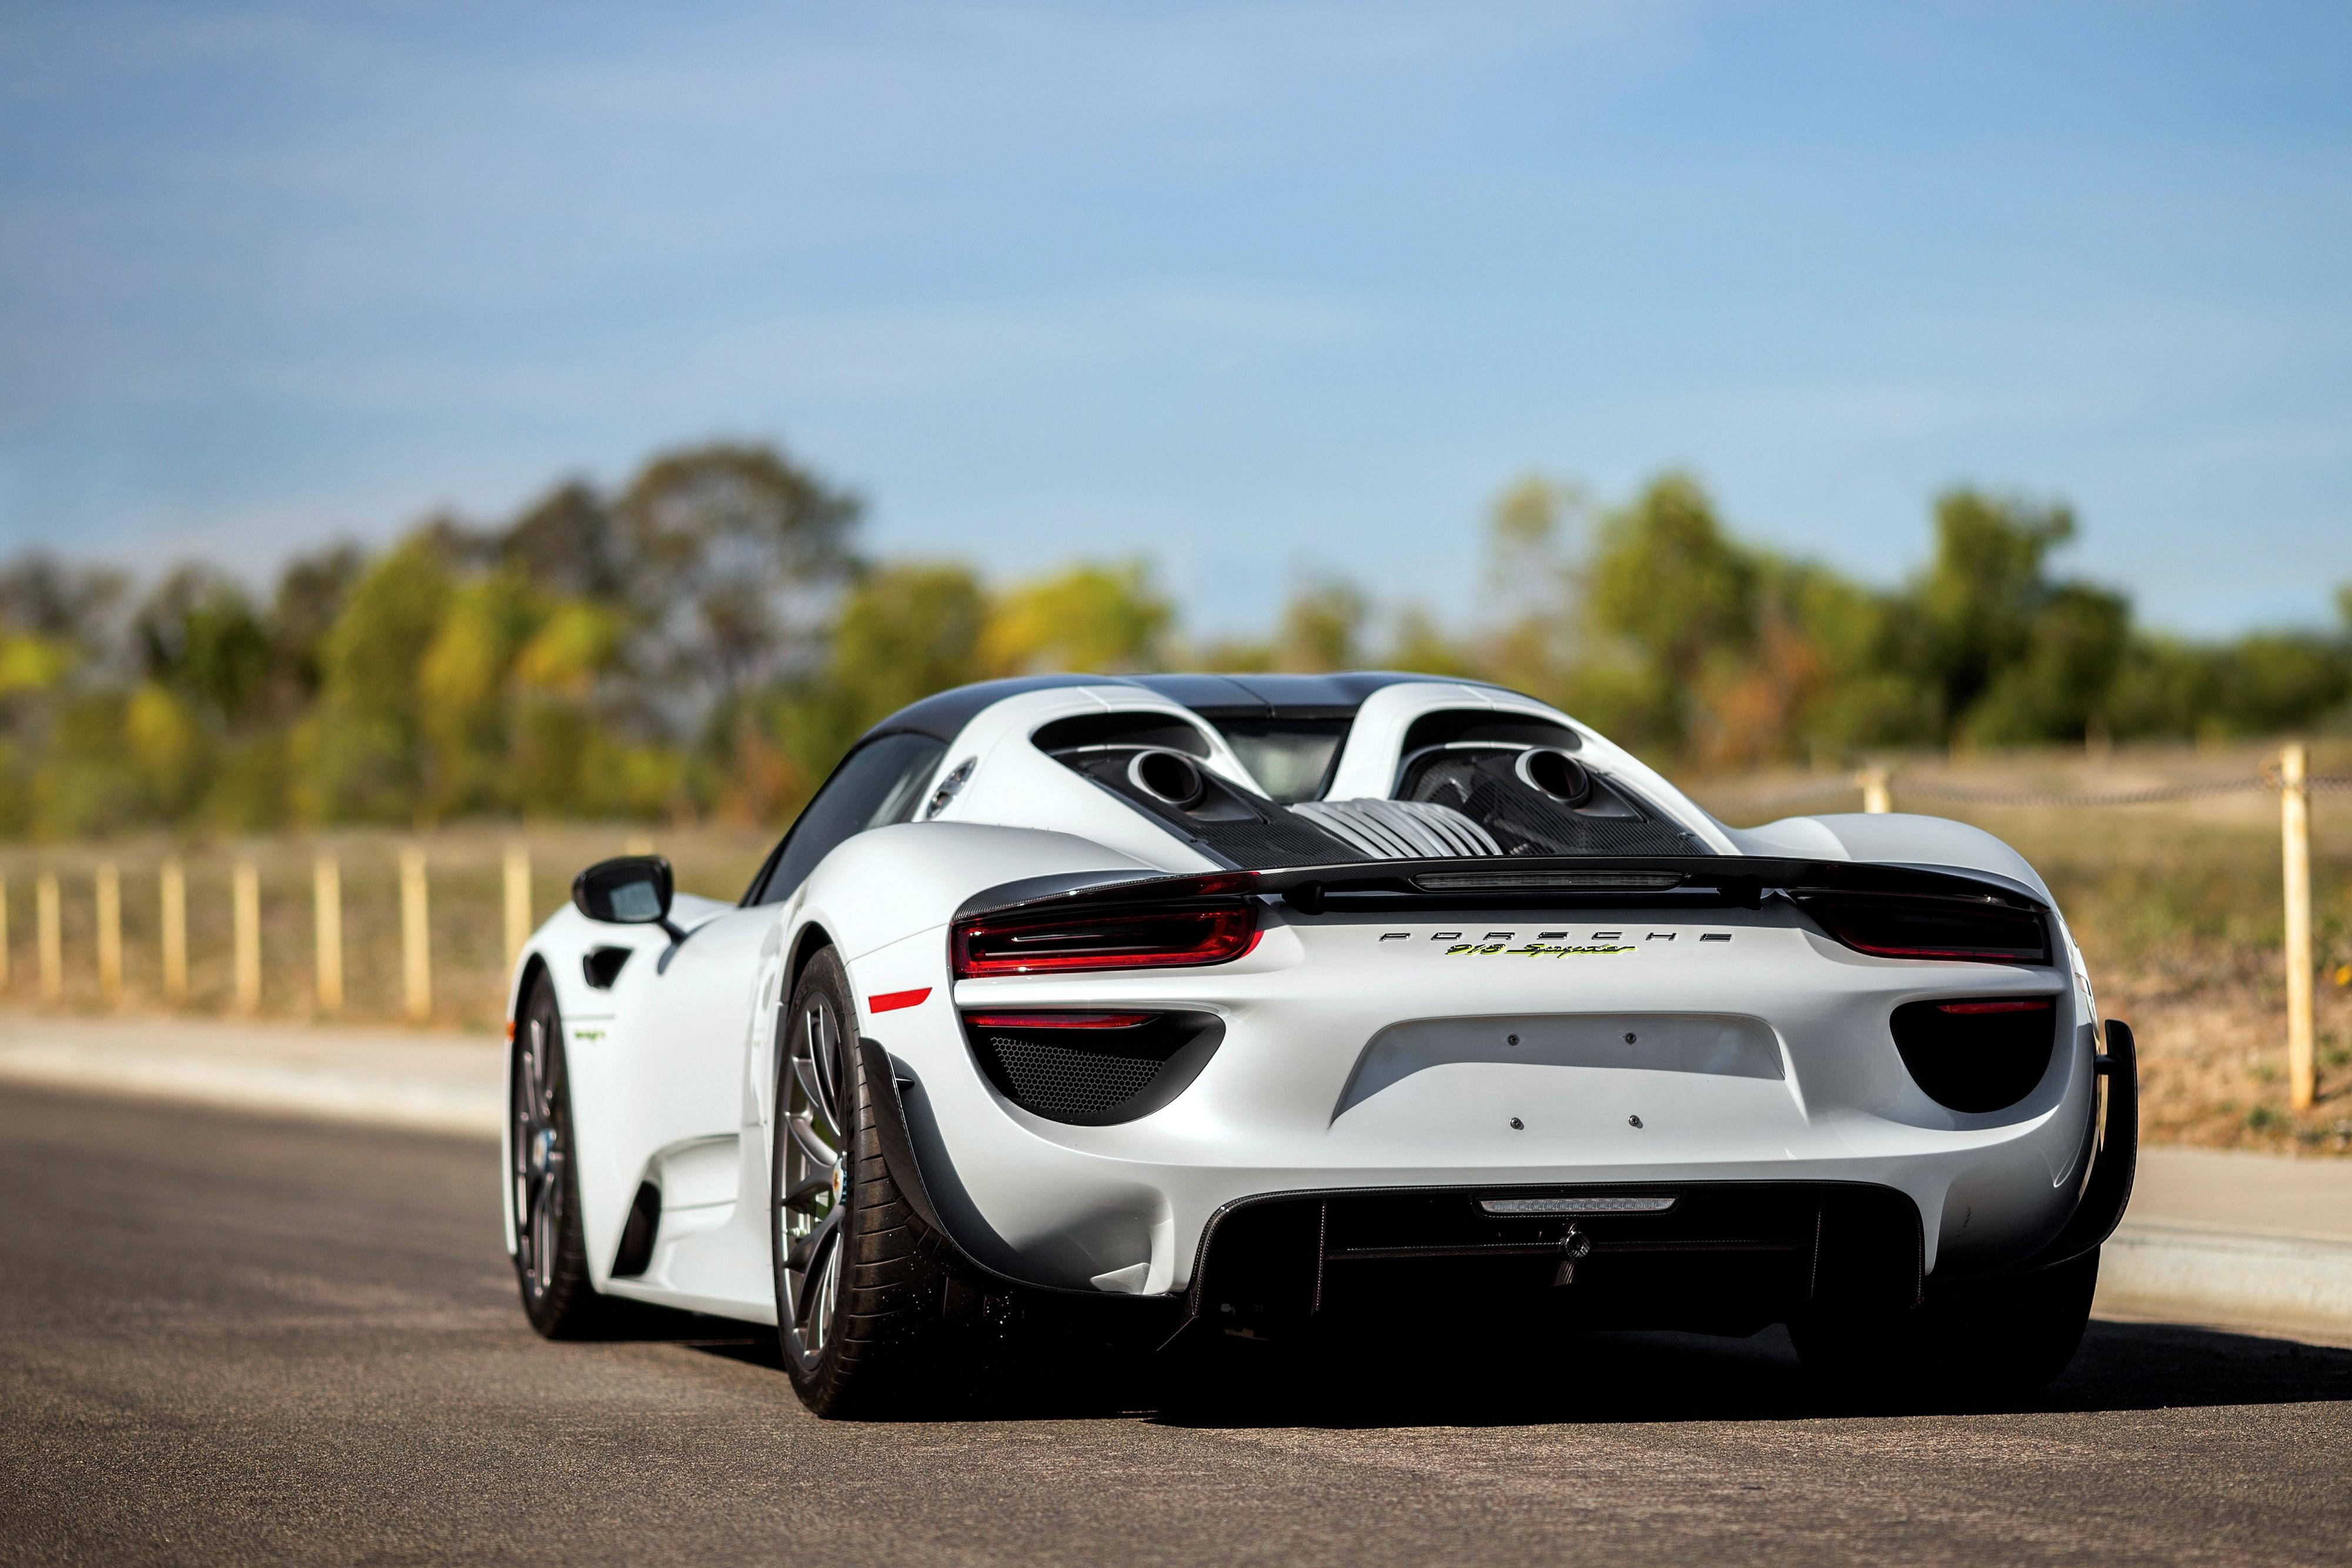 10 New Porsche 918 Spyder Wallpaper FULL HD 1080p For PC ...